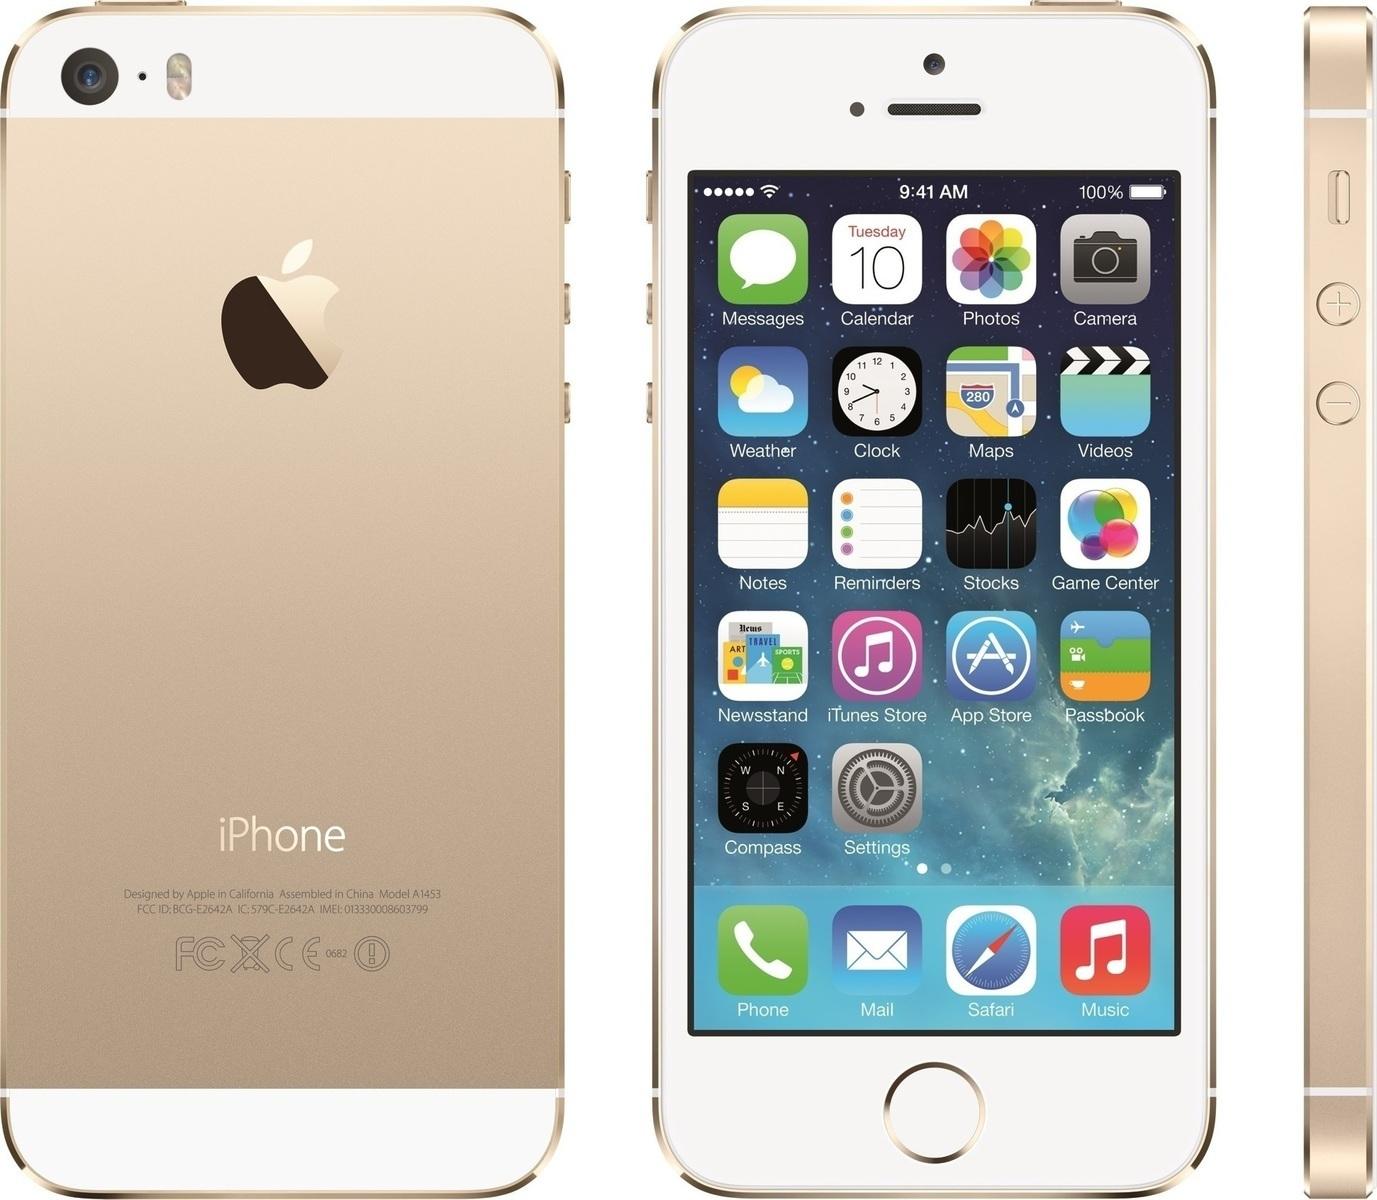 iphone 5s ποσες ωρες το φορτιζει